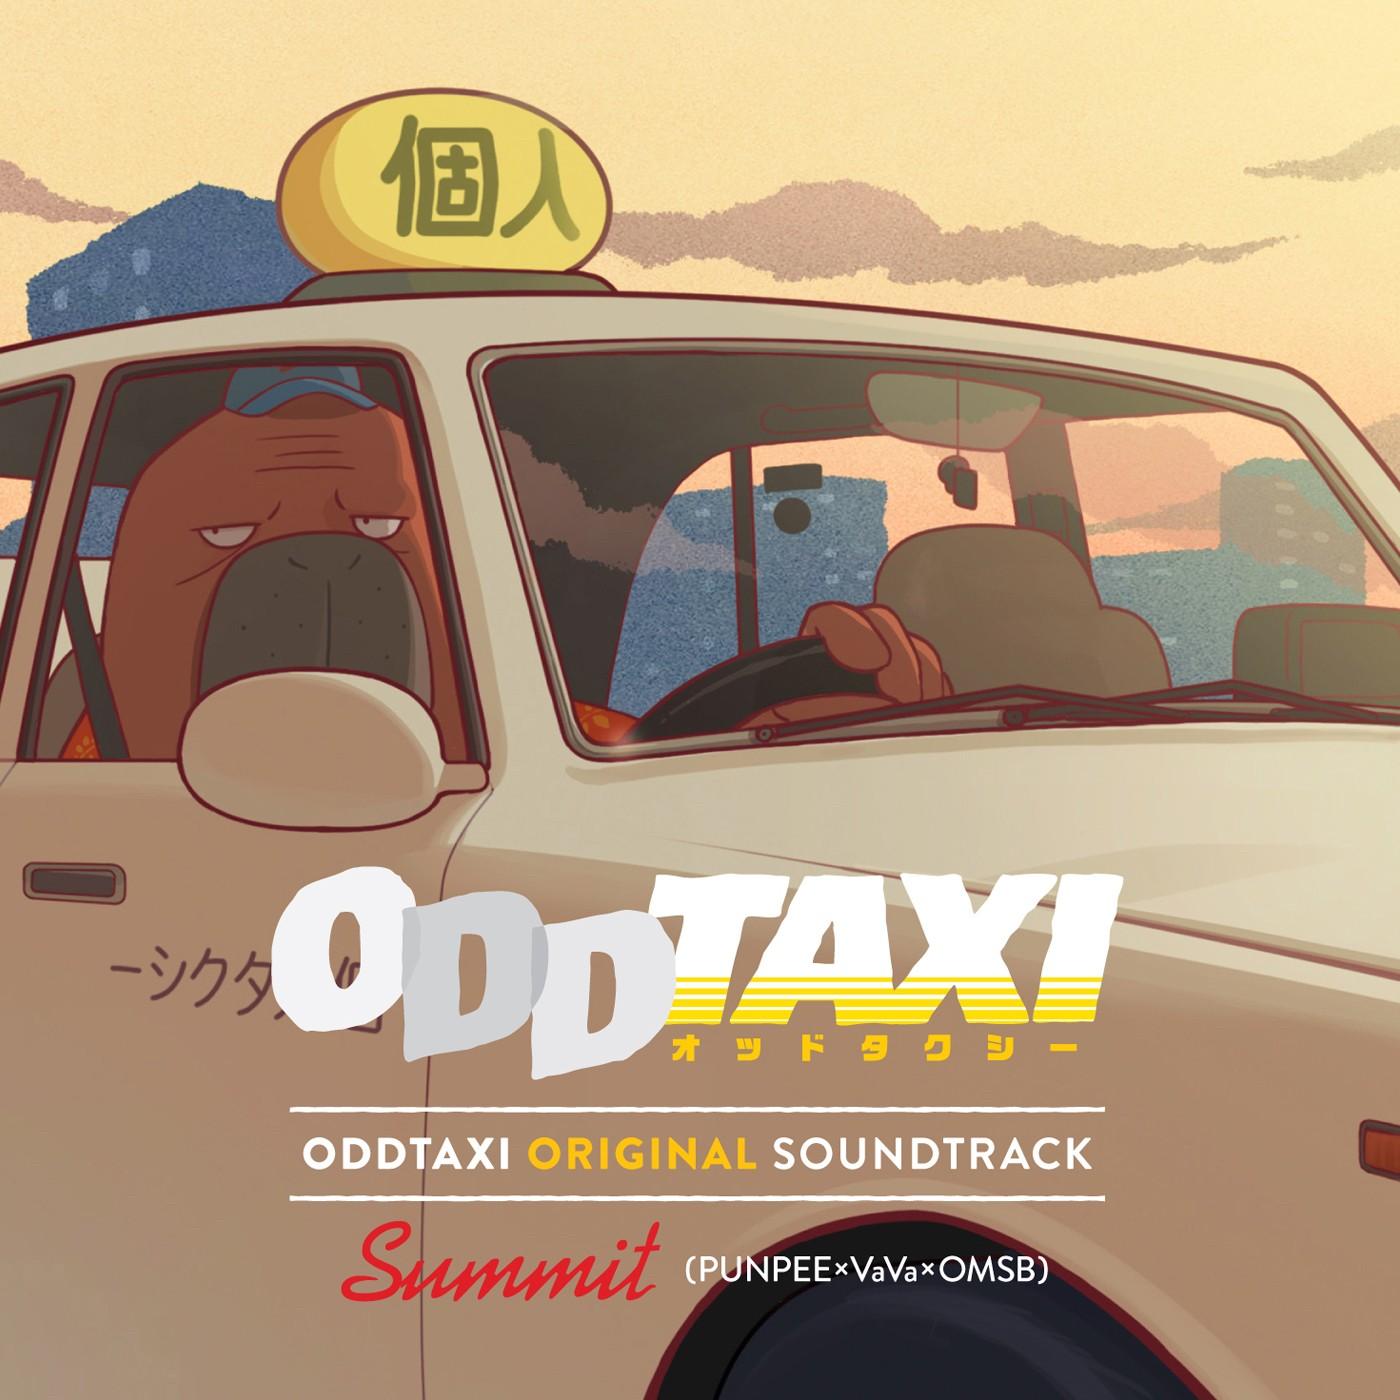 [Album] SUMMIT(PUNPEExVaVaxOMSB) – ODDTAXI ORIGINAL SOUNDTRACK [FLAC / 24bit Lossless / WEB] [2021.05.19]